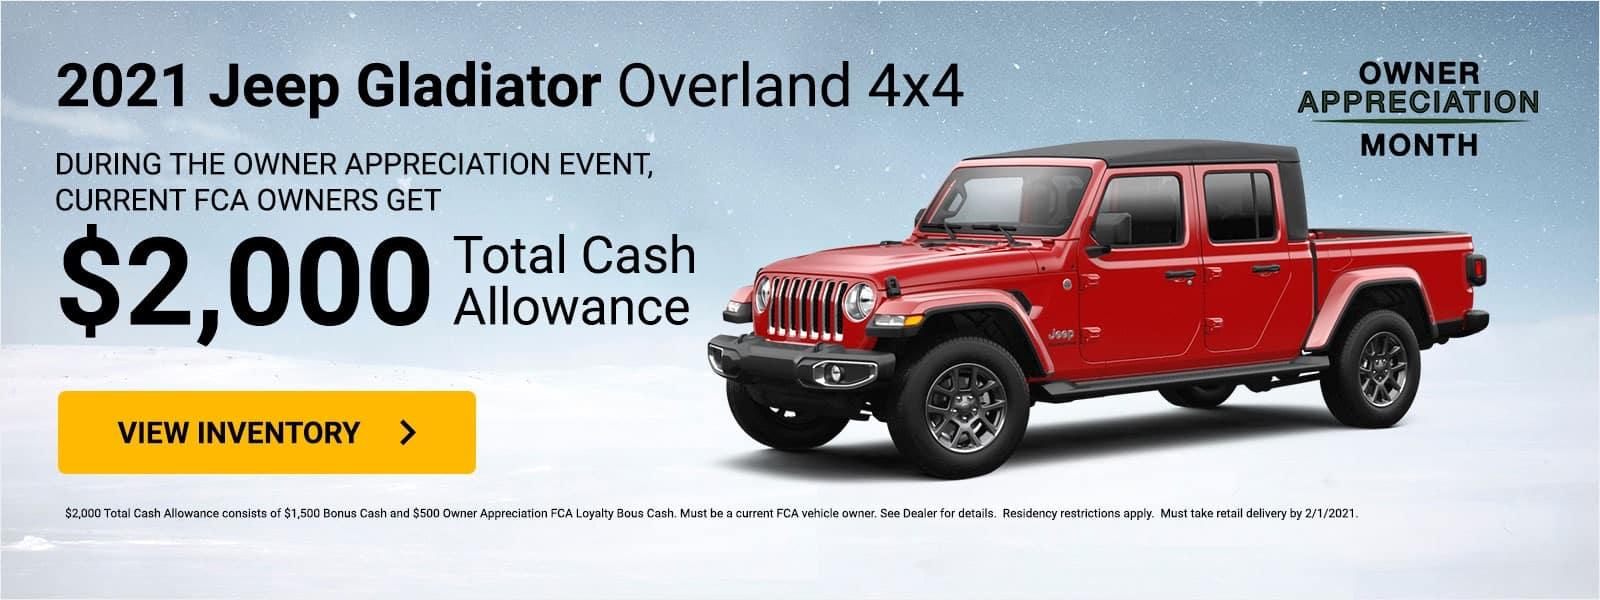 Owner Appreciation Jeep Gladiator